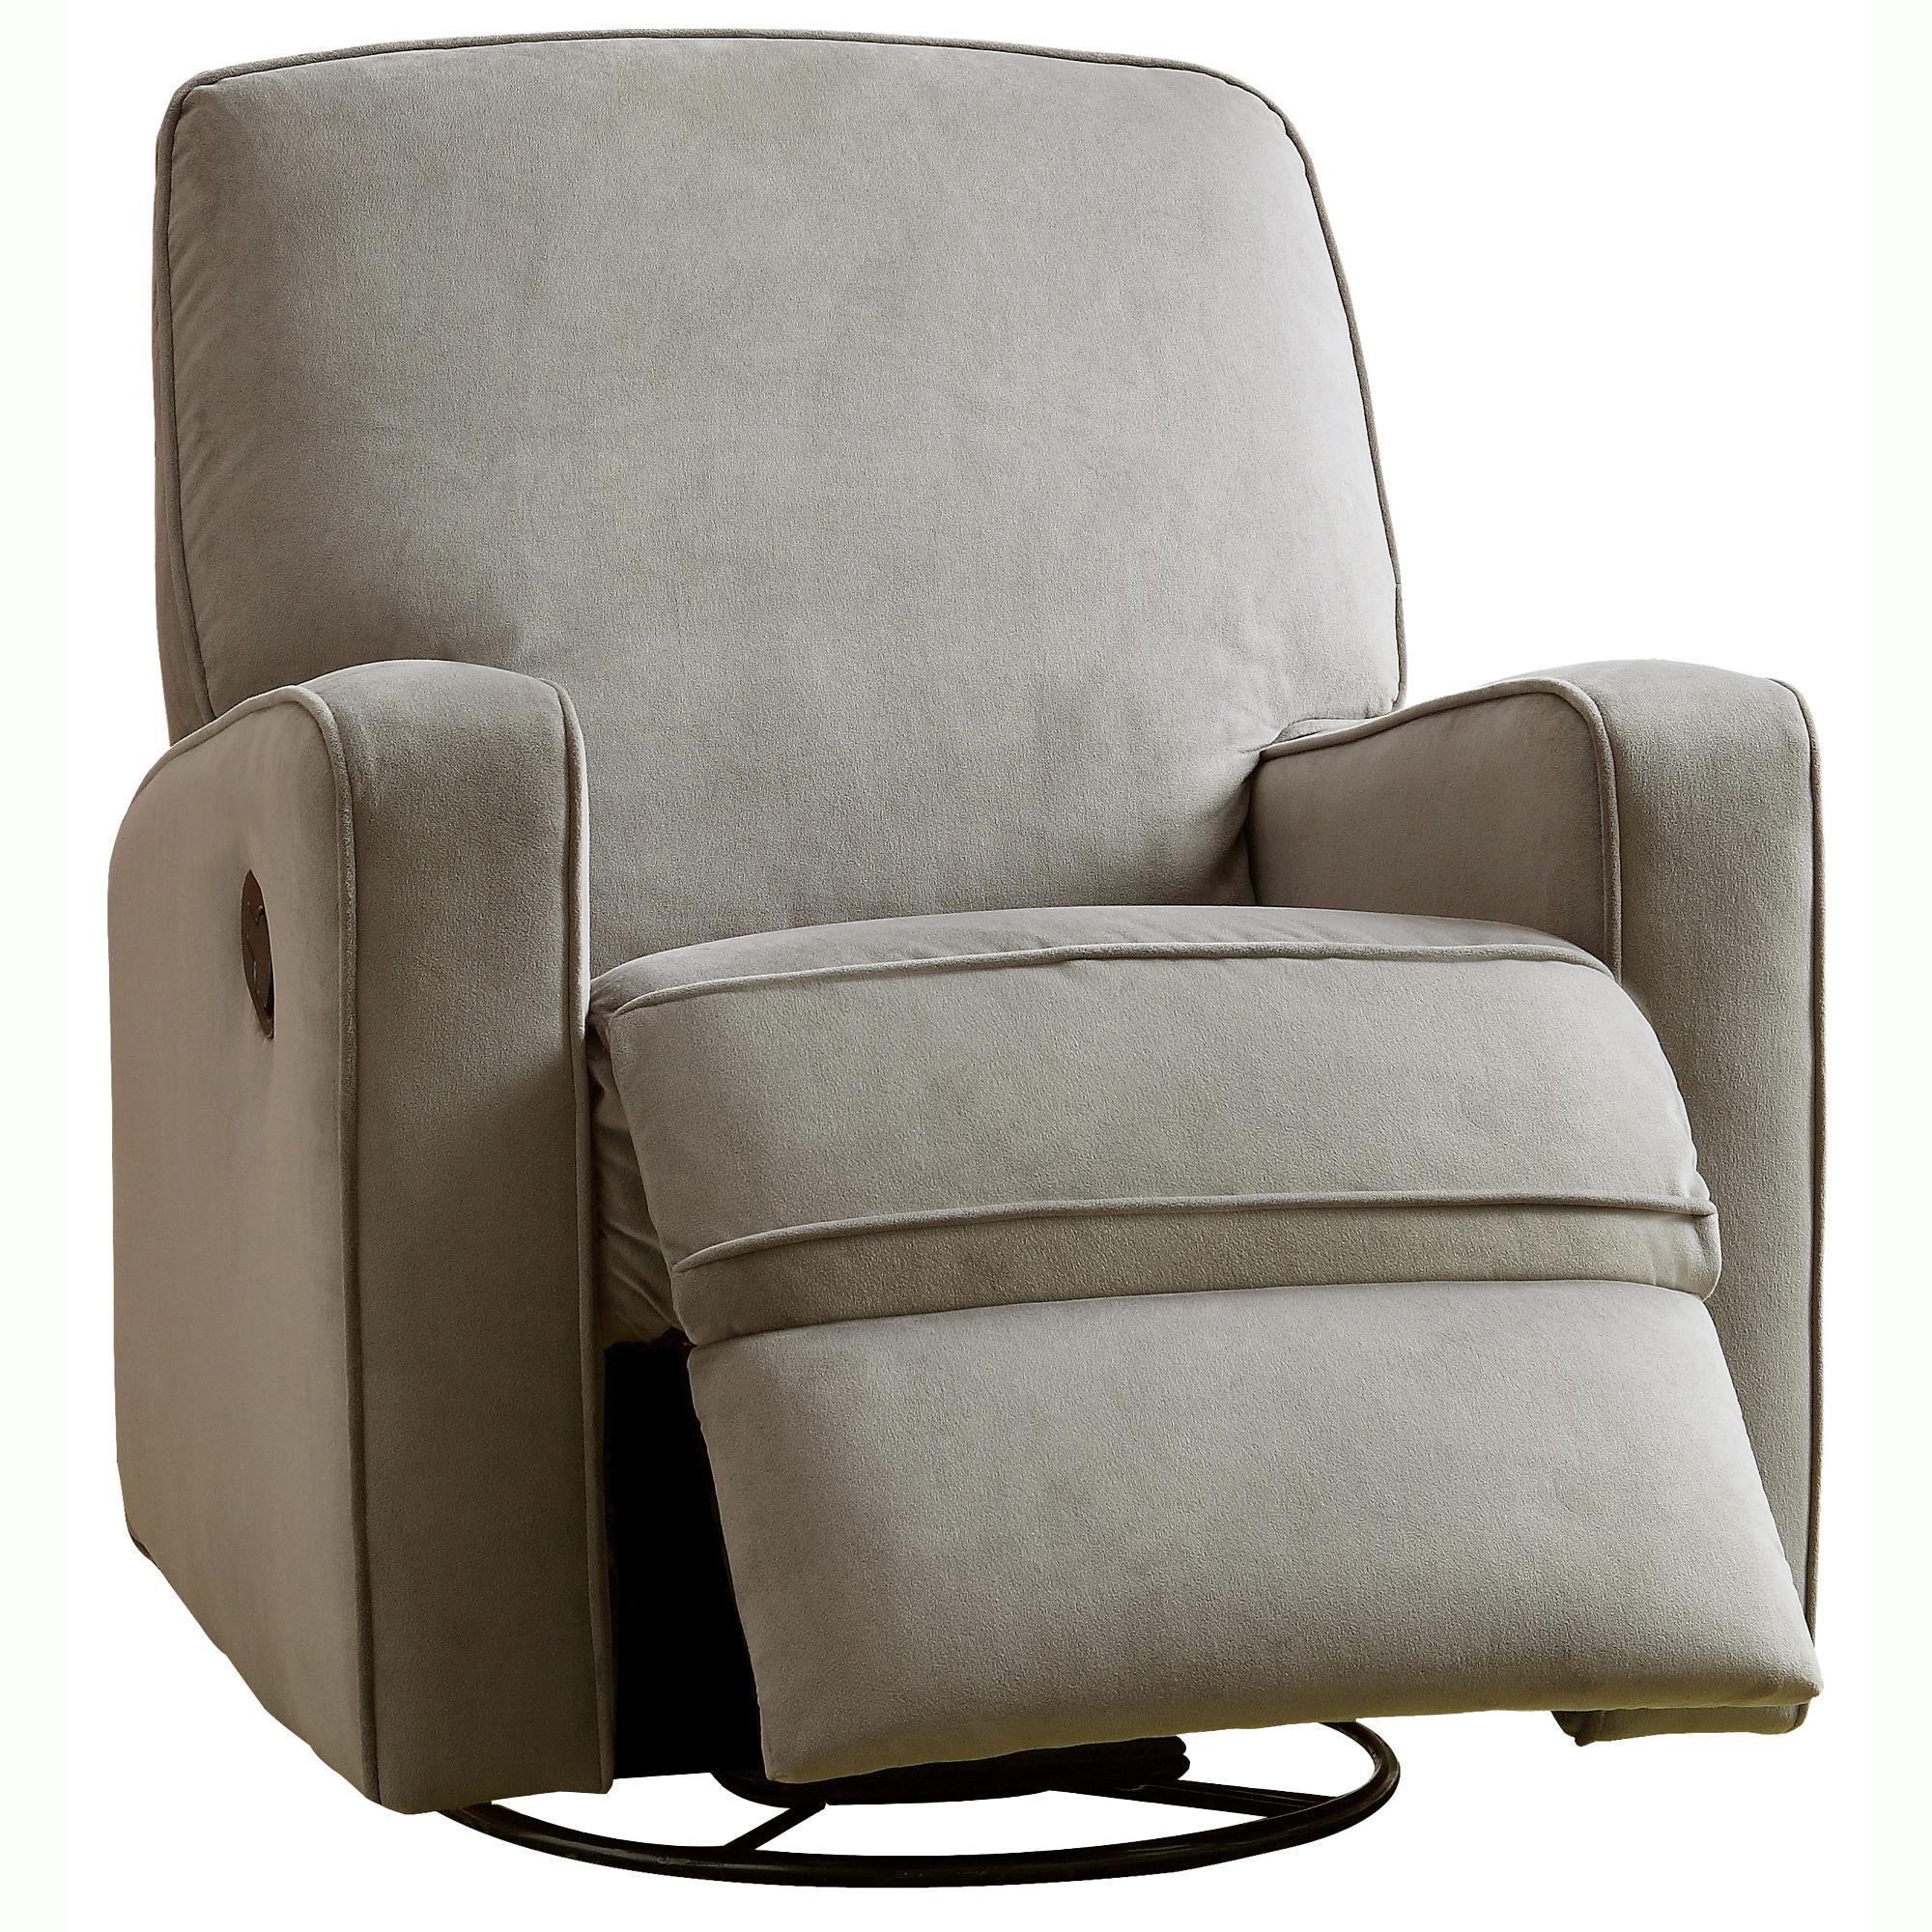 colton gray fabric modern nursery swivel glider recliner chair  freeshipping today  overstockcom  . colton gray fabric modern nursery swivel glider recliner chair